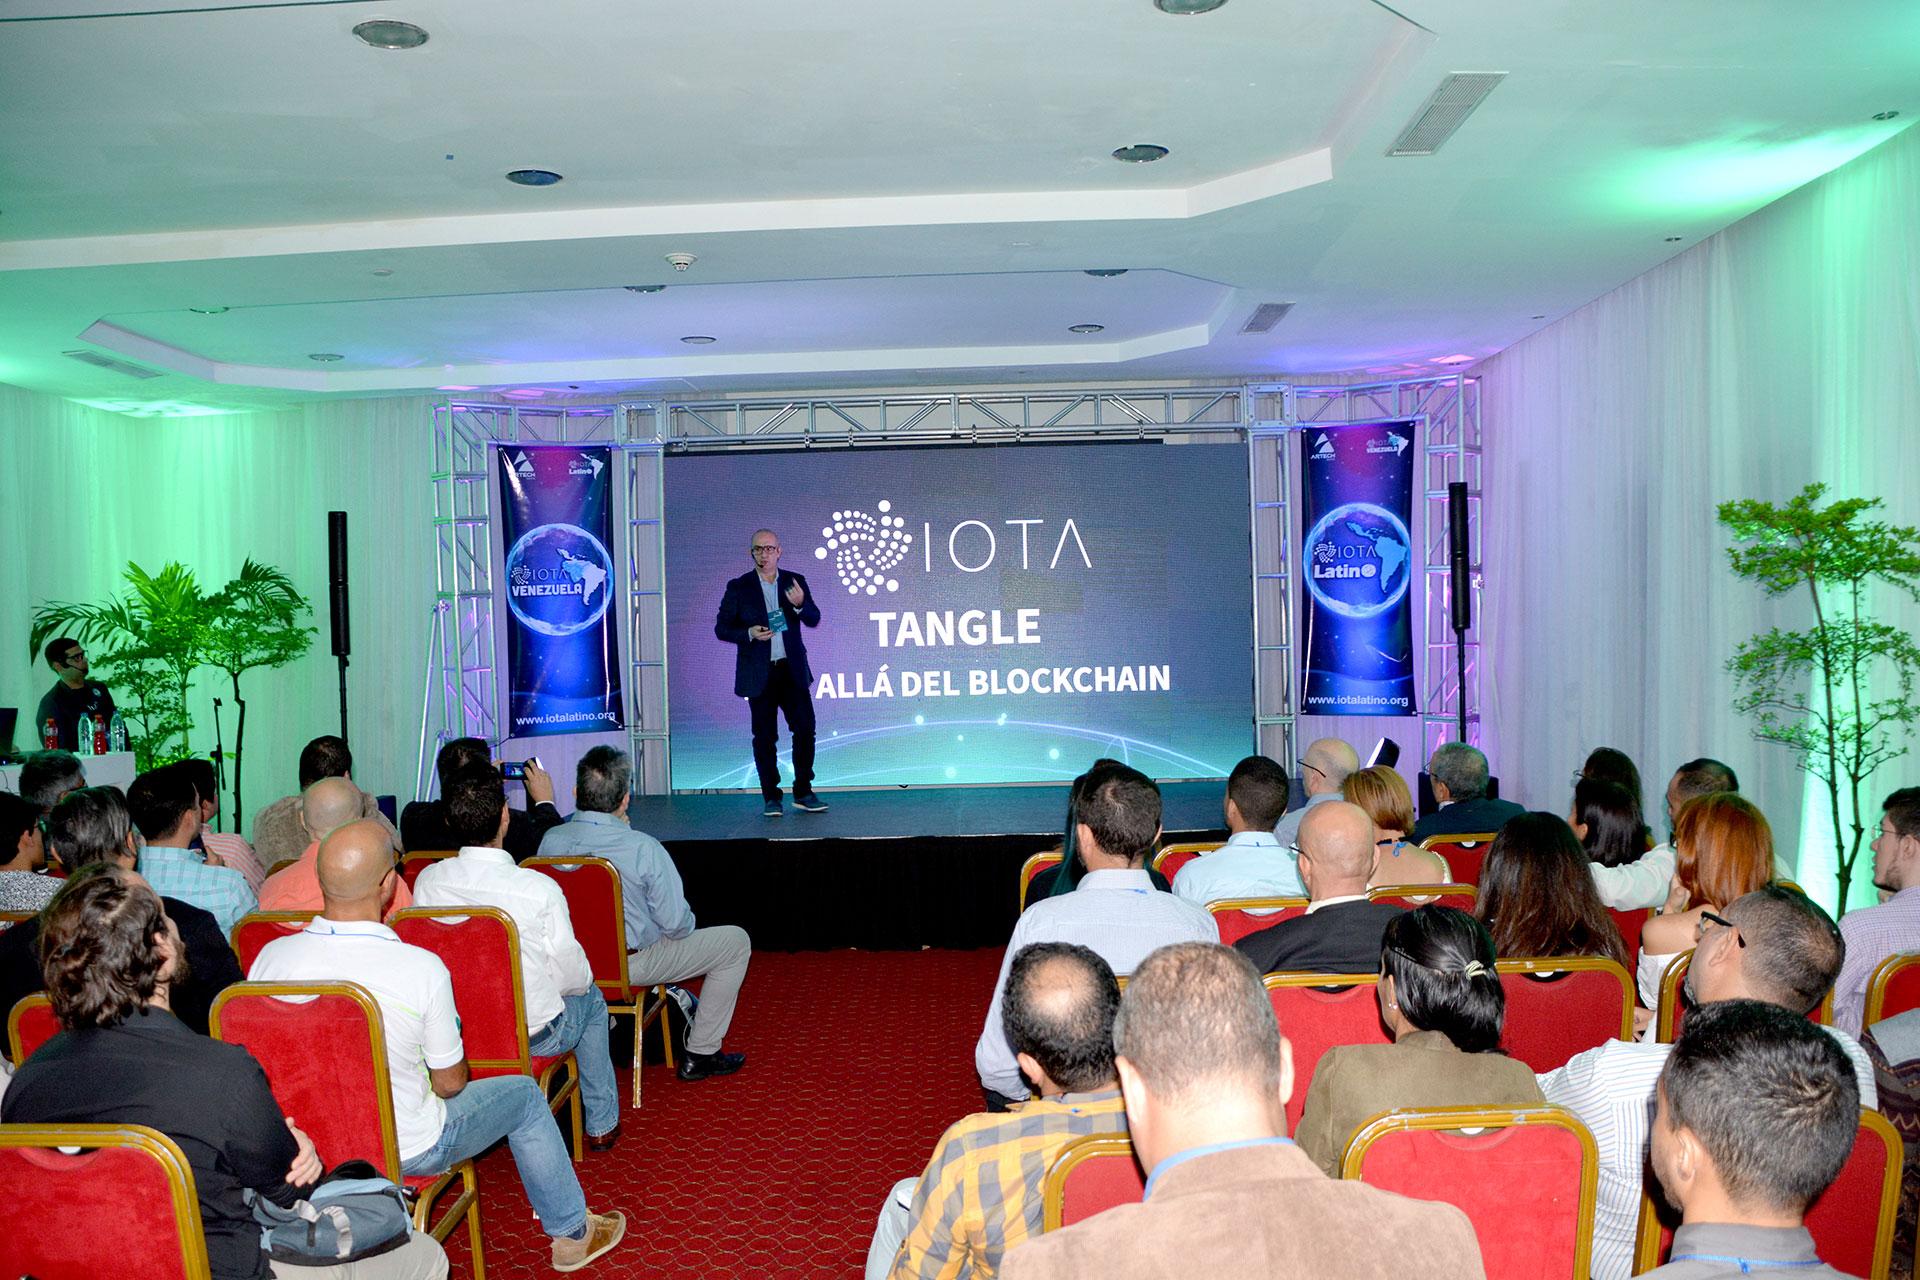 primer meetup de IOTA en Venezuela - Saul Ameliach